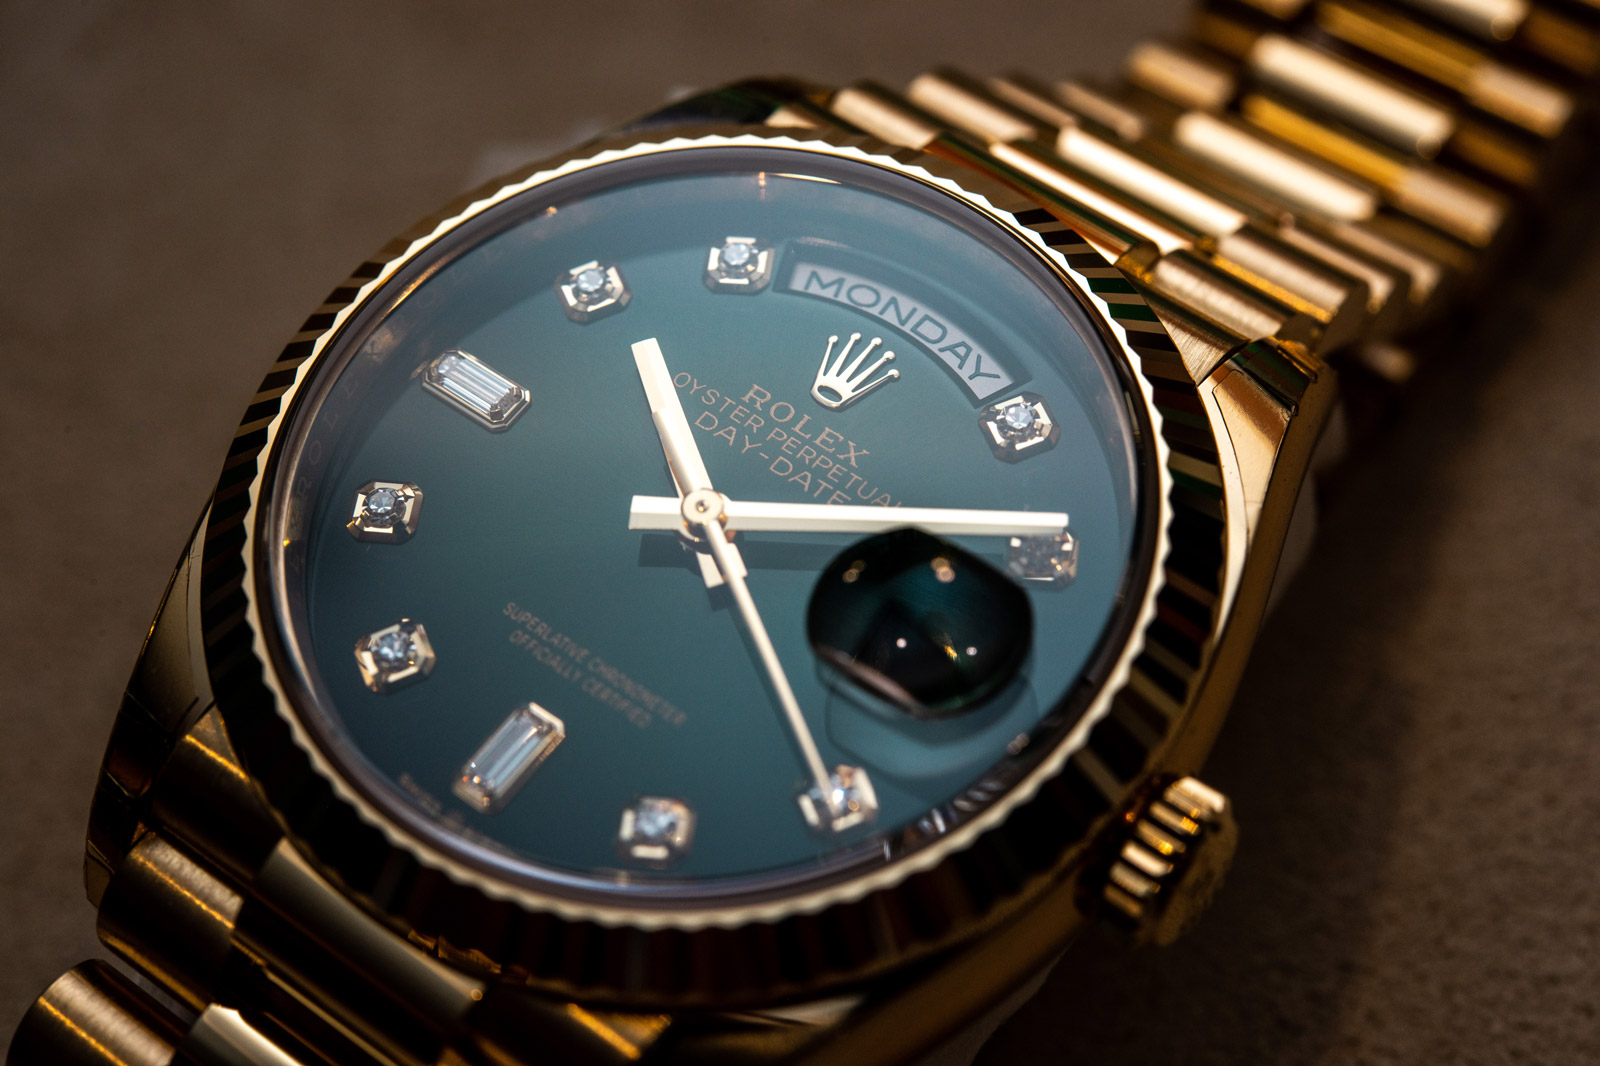 Rolex Day-Date 36, zeleni ombré brojčanik sa dijamantima - Ref. 128238